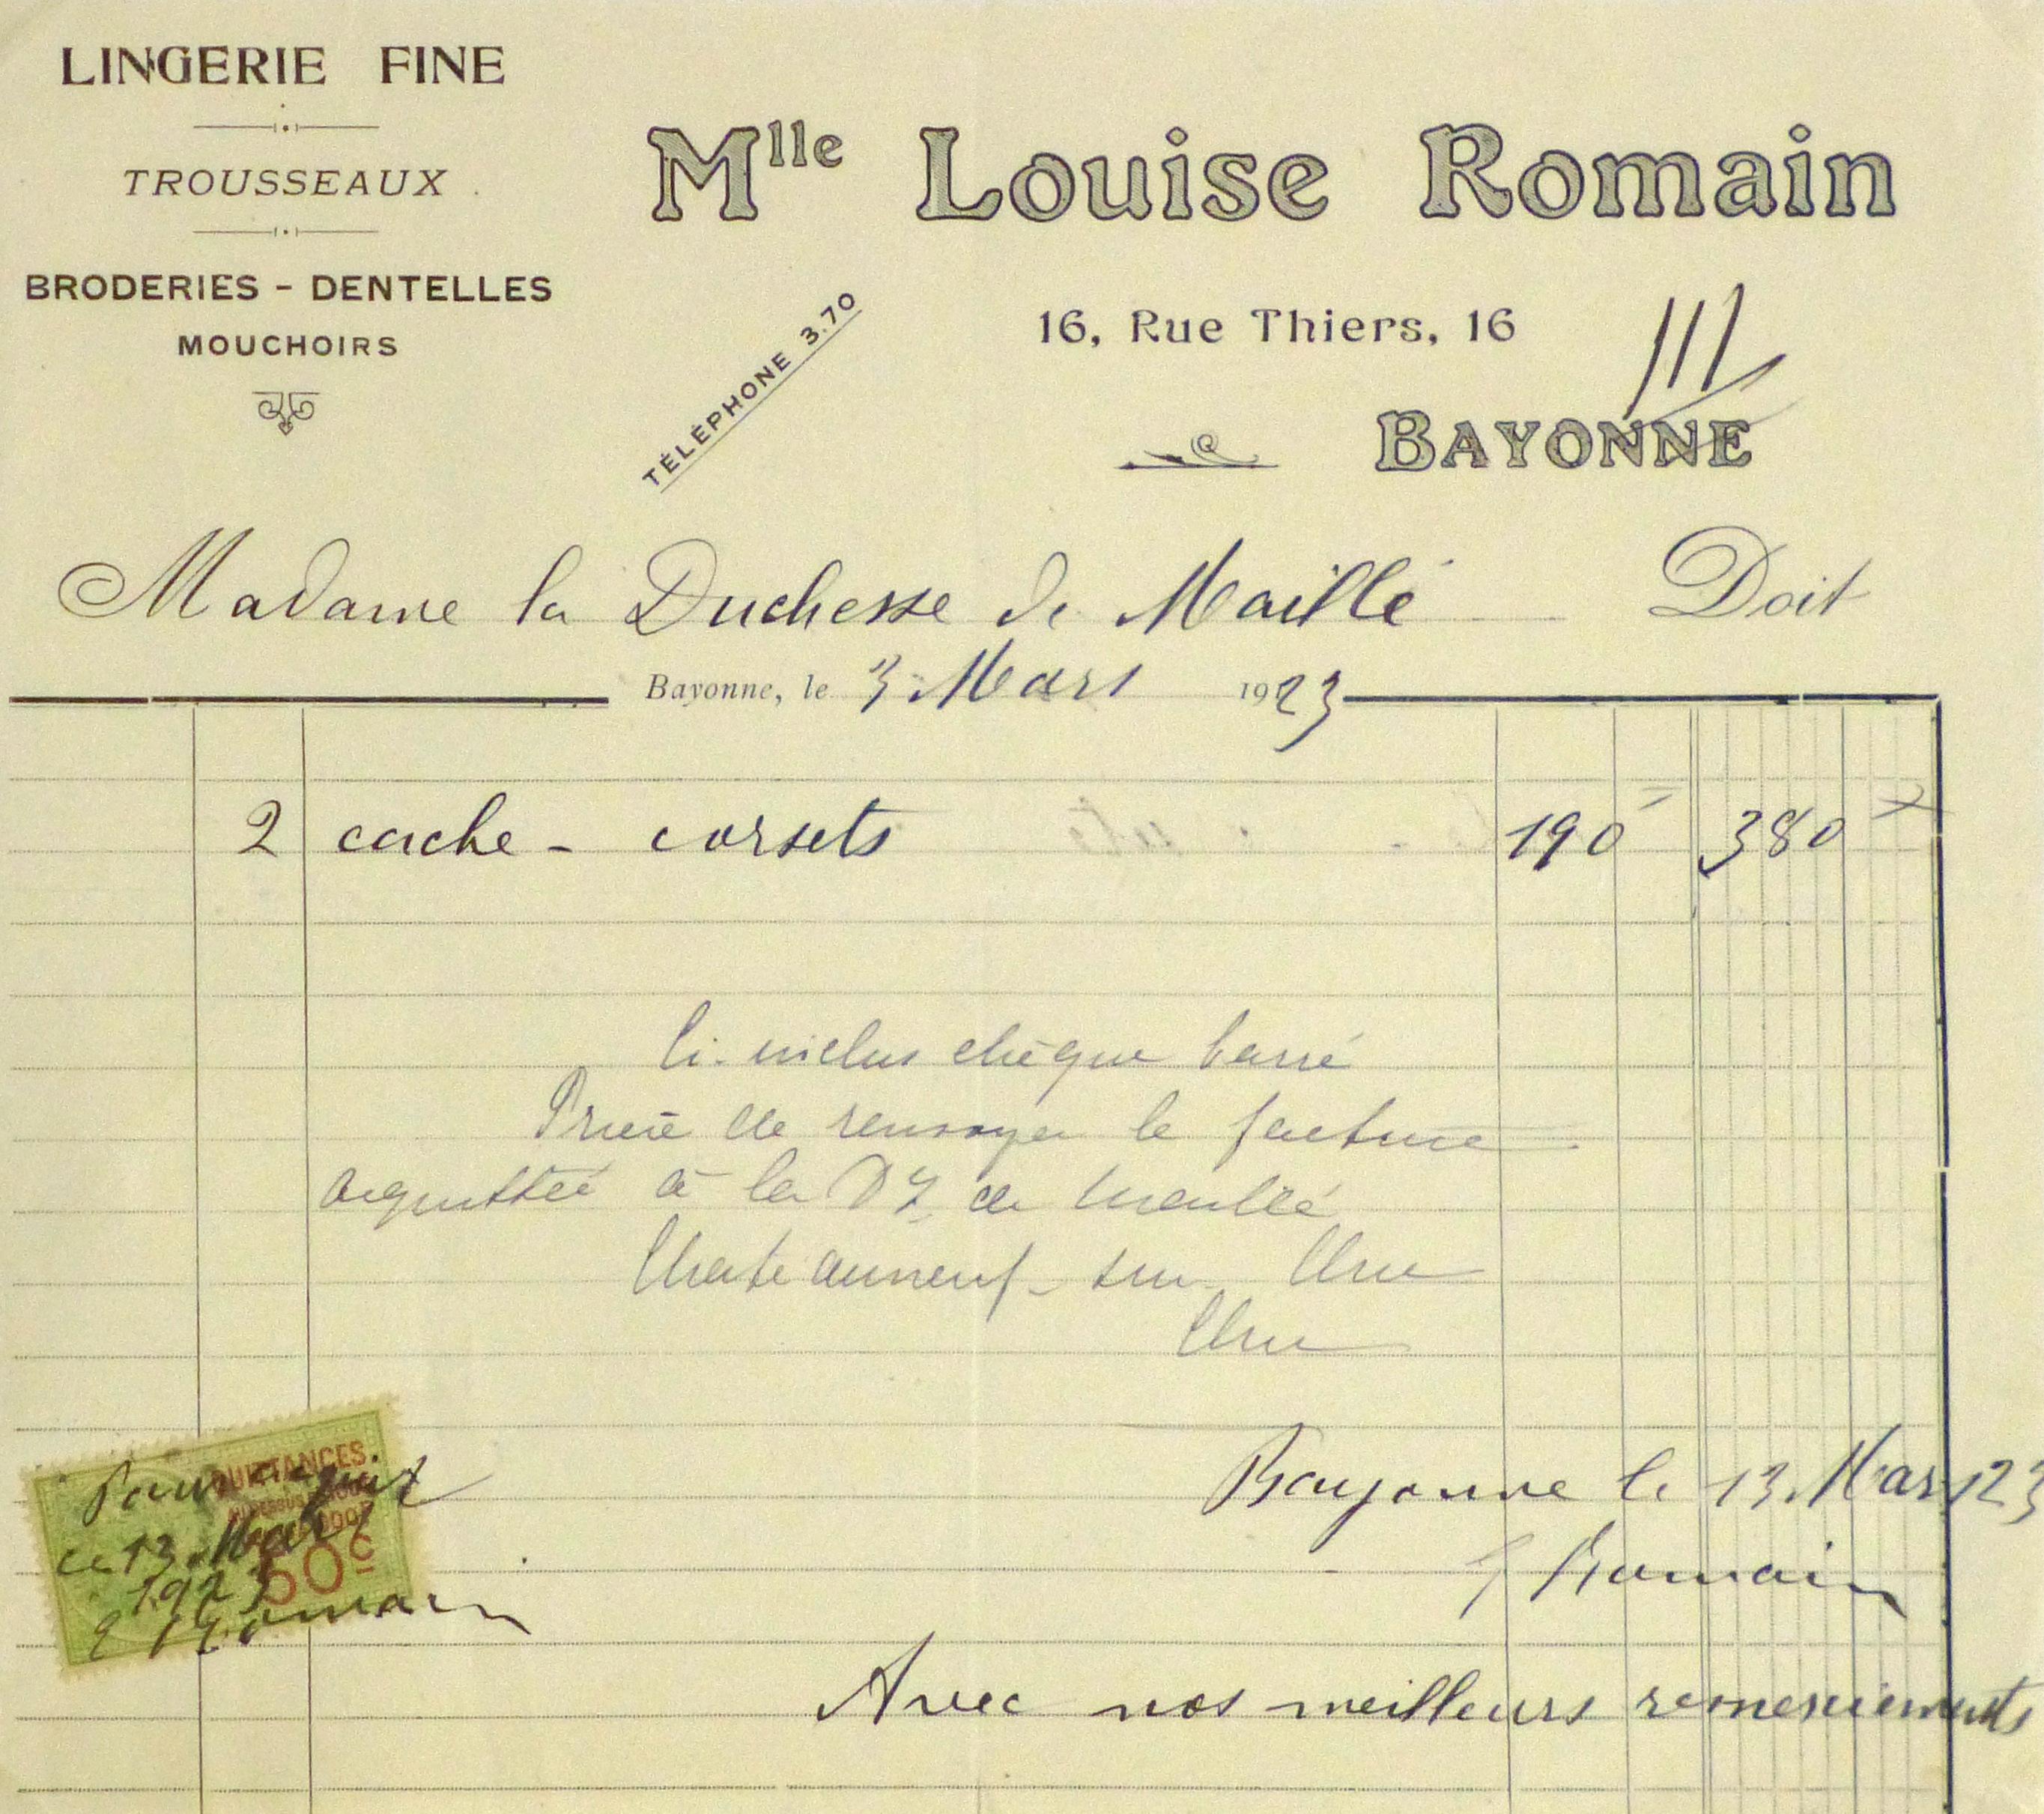 Duchess of Maillé Lingerie Receipt, 1923-main-10572M